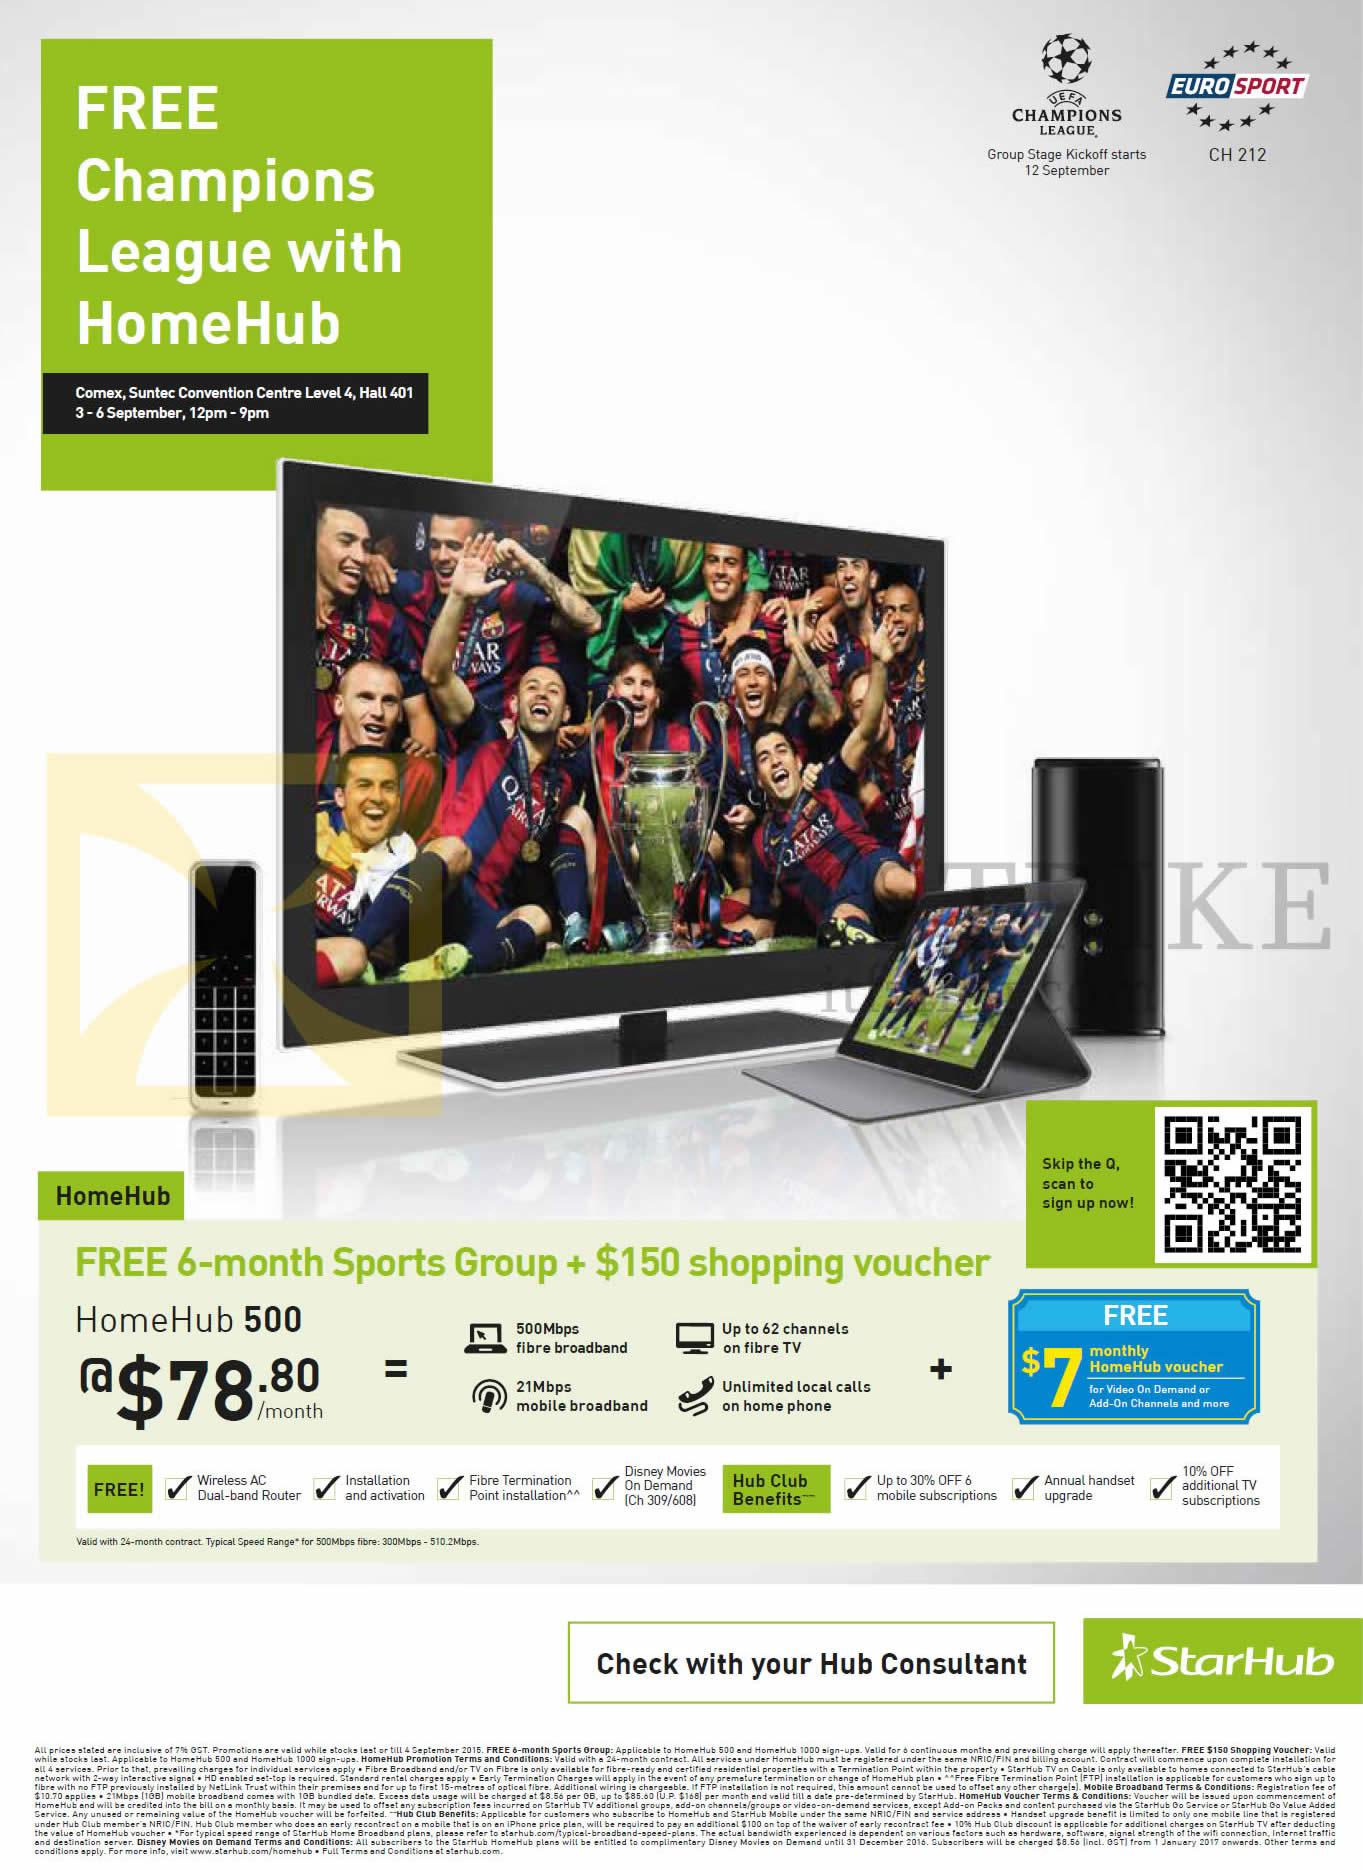 HomeHub 500, Free 6-month Sports Group, 150 dollar shopping voucher